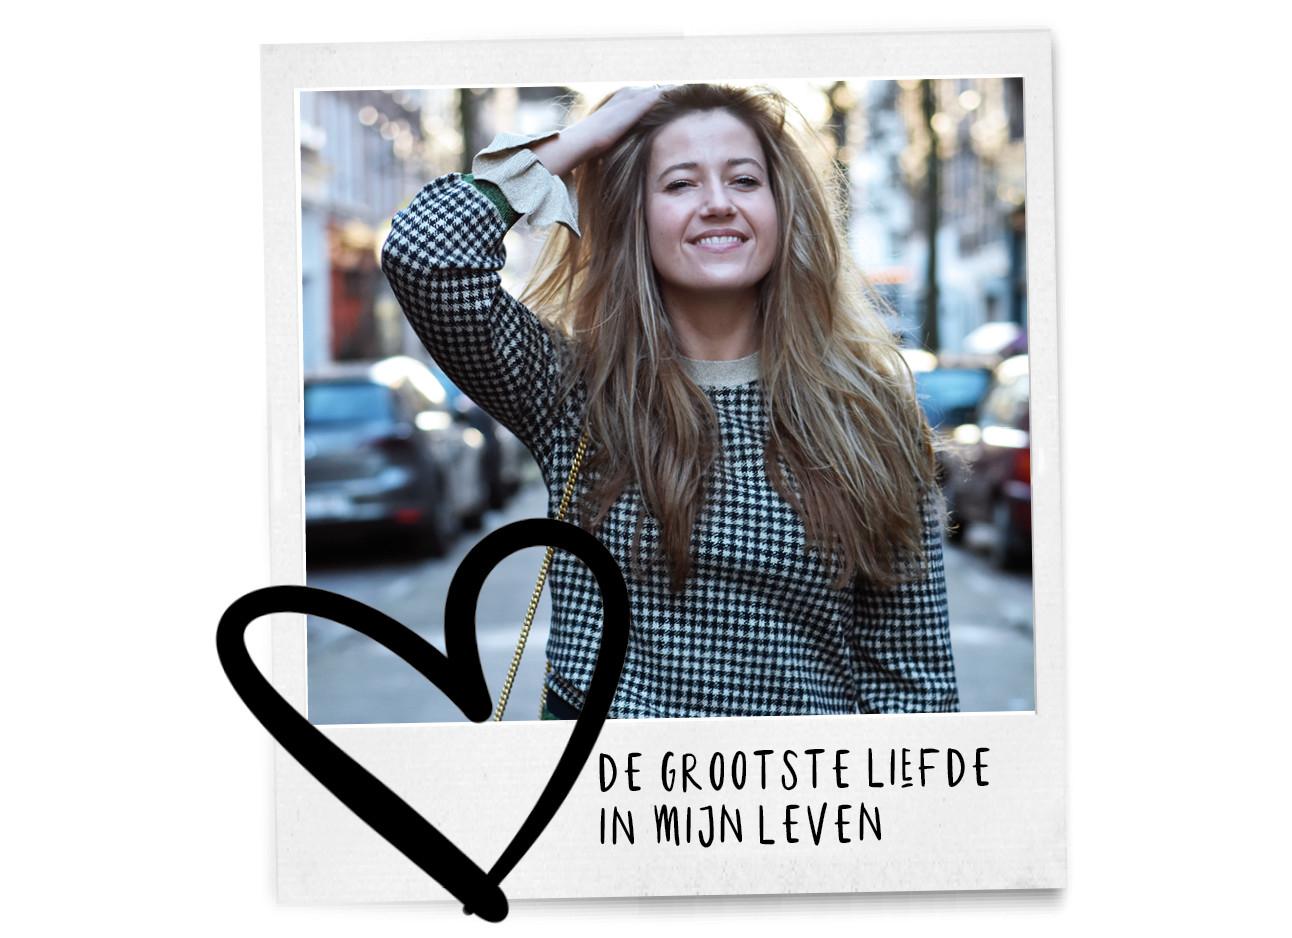 tessa lachend op straat in amsterdam